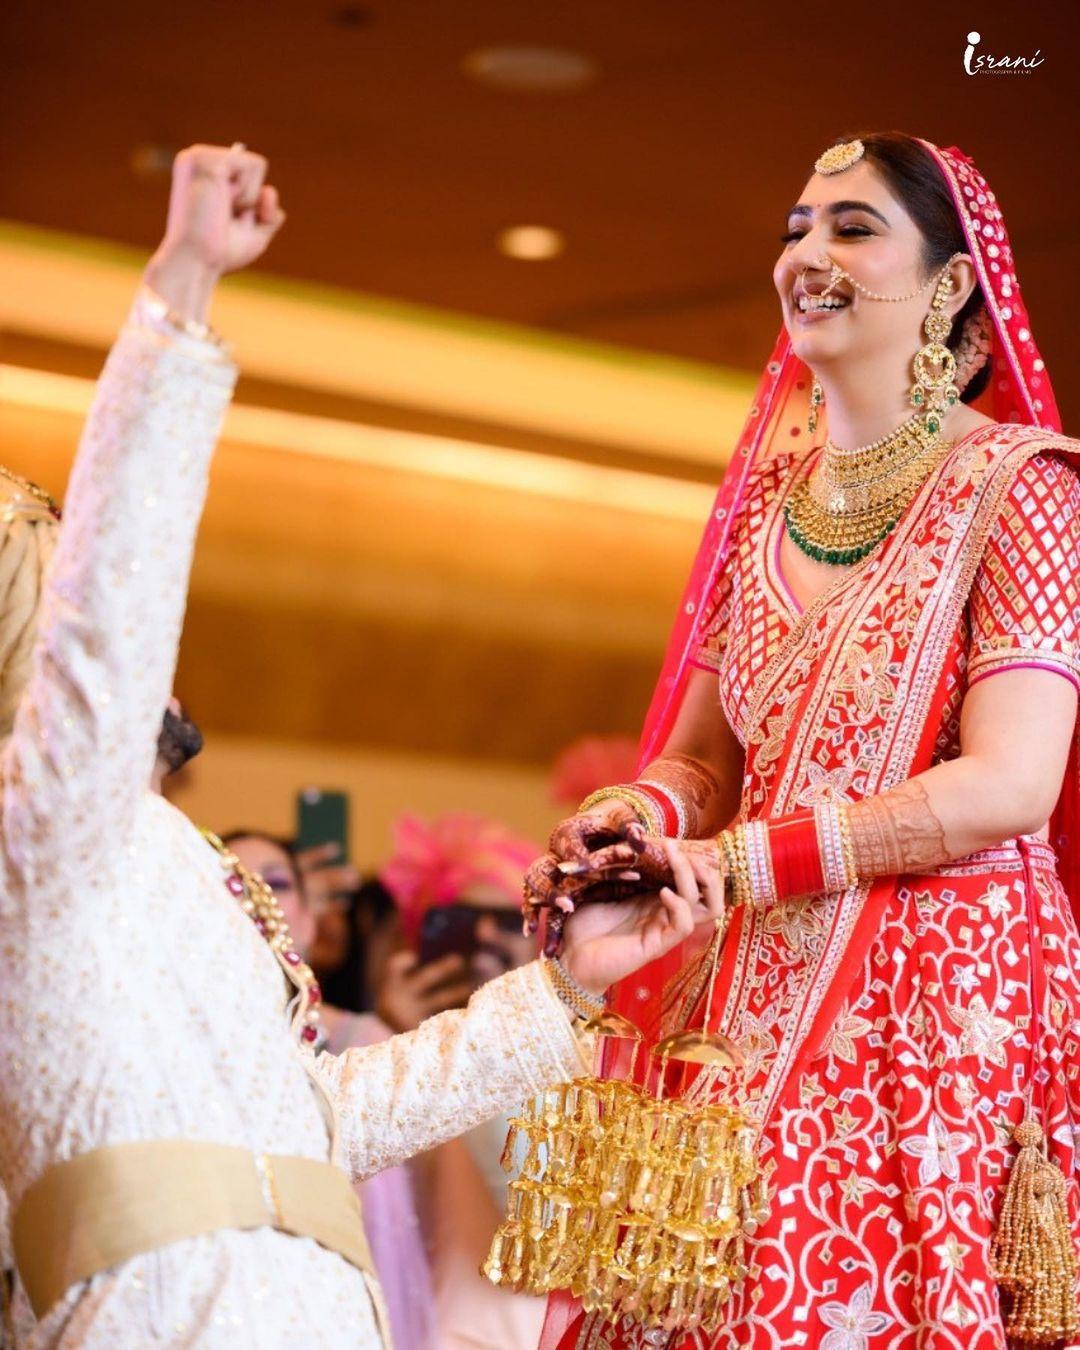 rahul and disha wedding